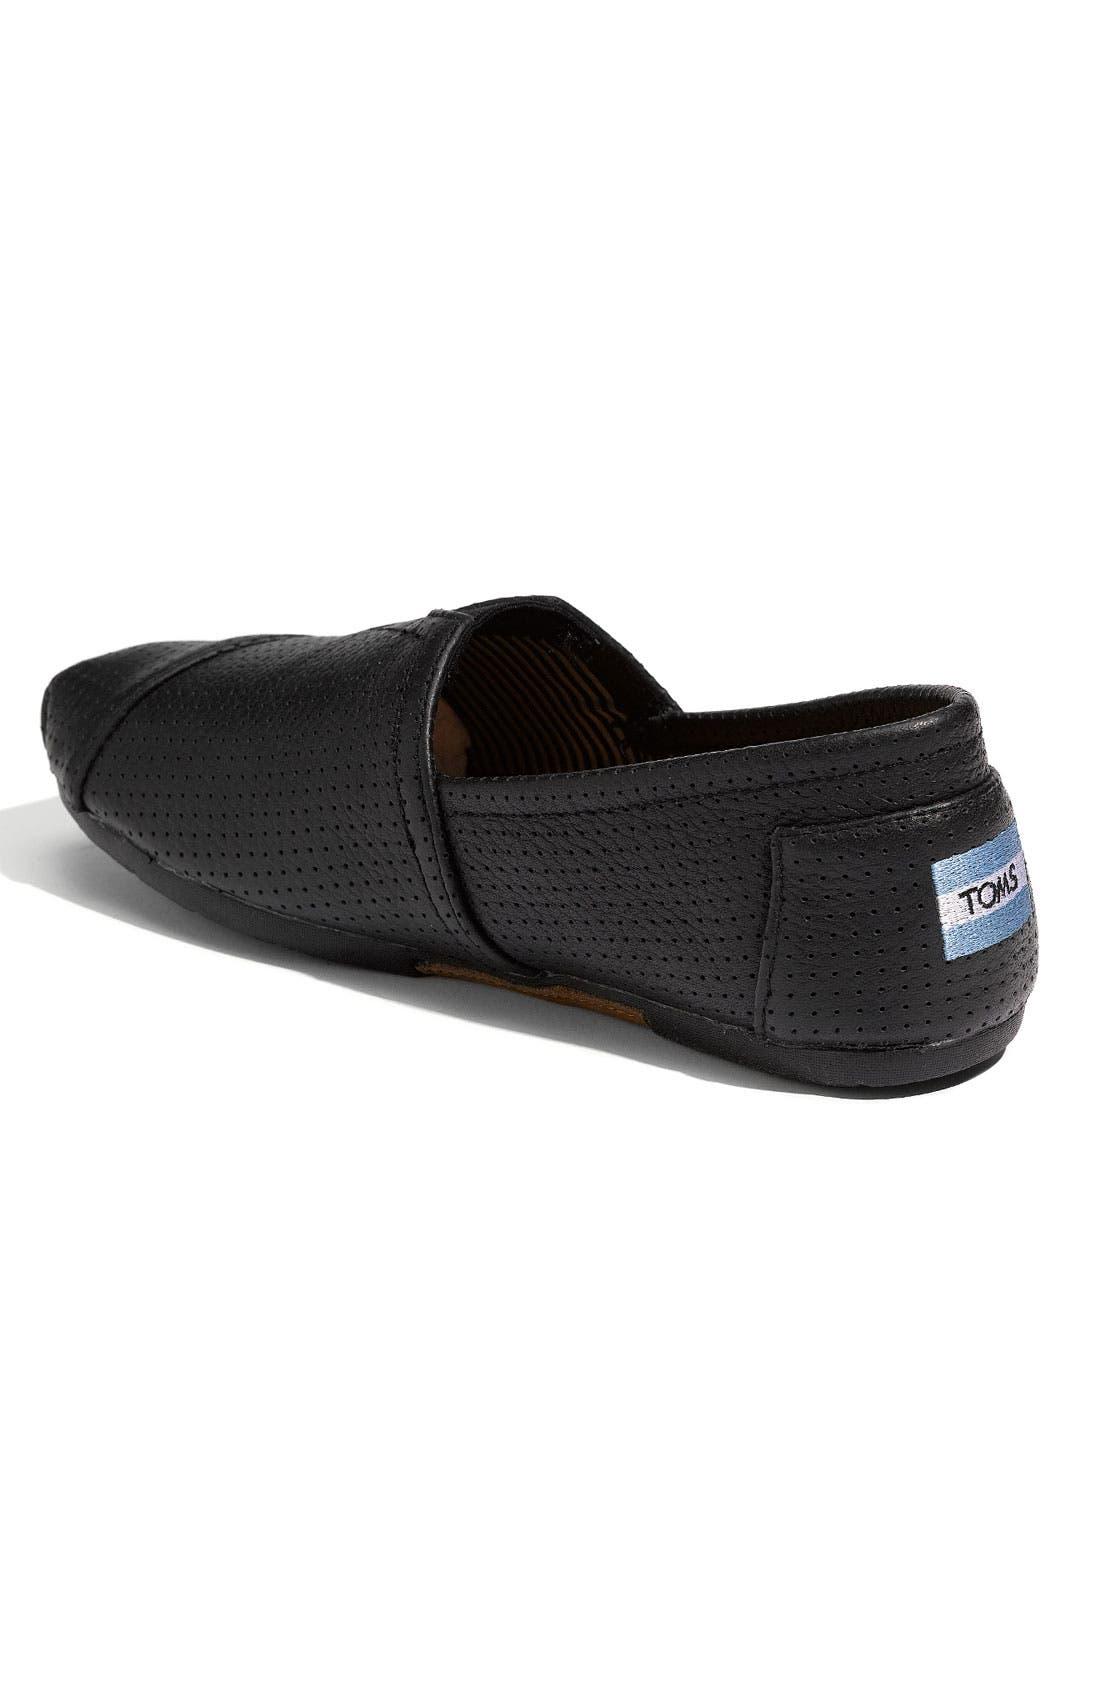 Alternate Image 2  - TOMS Perforated Leather Slip-On (Men)